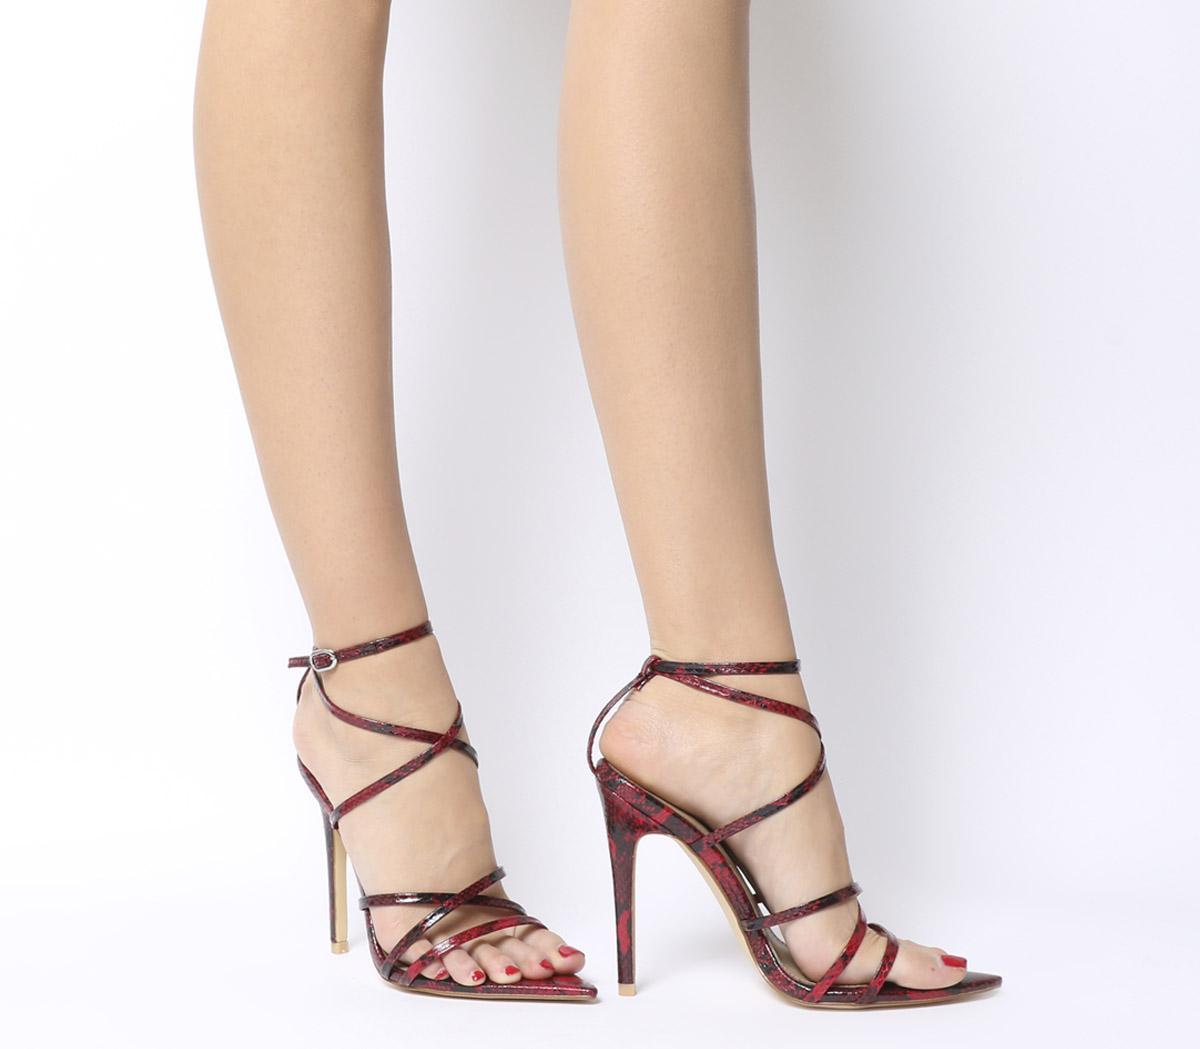 Kaia Strappy Heels